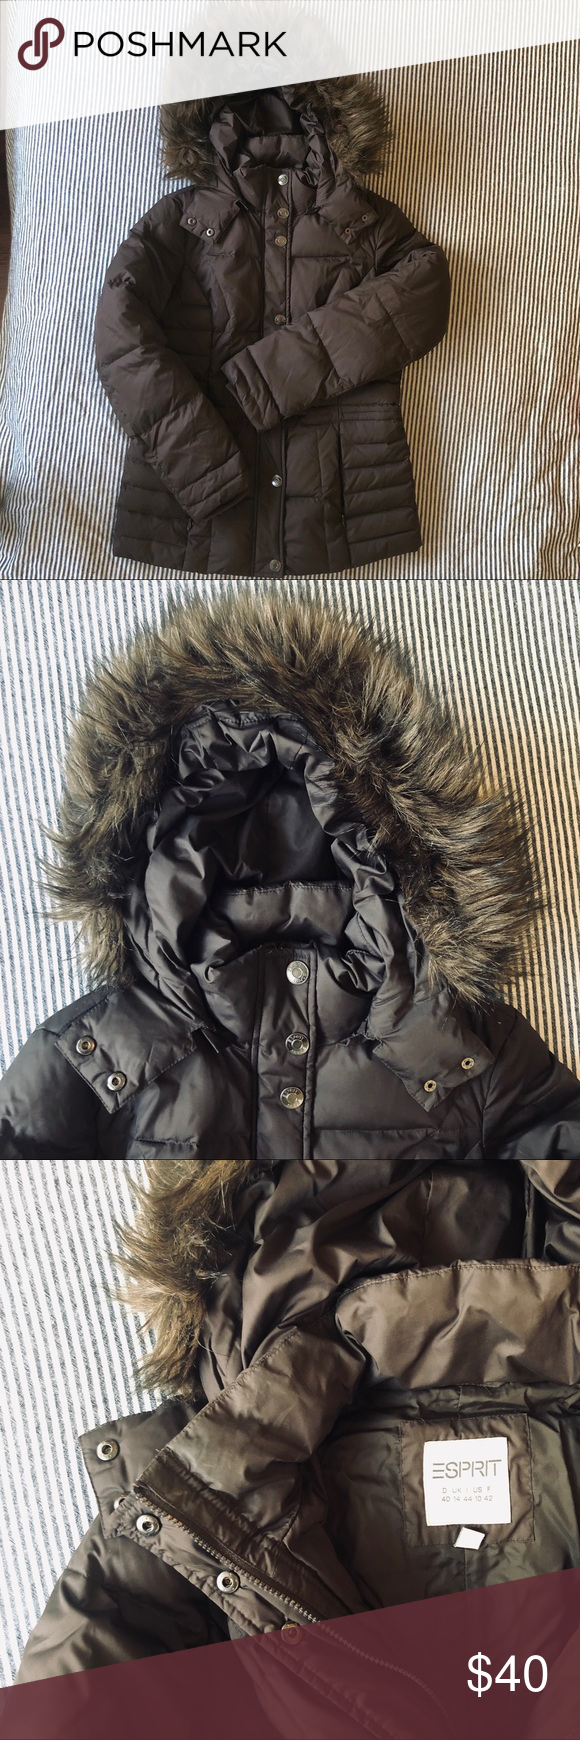 Esprit Winter Jacket With Faux Fur Hood Us10 Brown Down Jacket From Esprit With Faux Fur Hood Women S Size 10 Fill Faux Fur Hood Fur Hood Winter Jackets [ 1740 x 580 Pixel ]